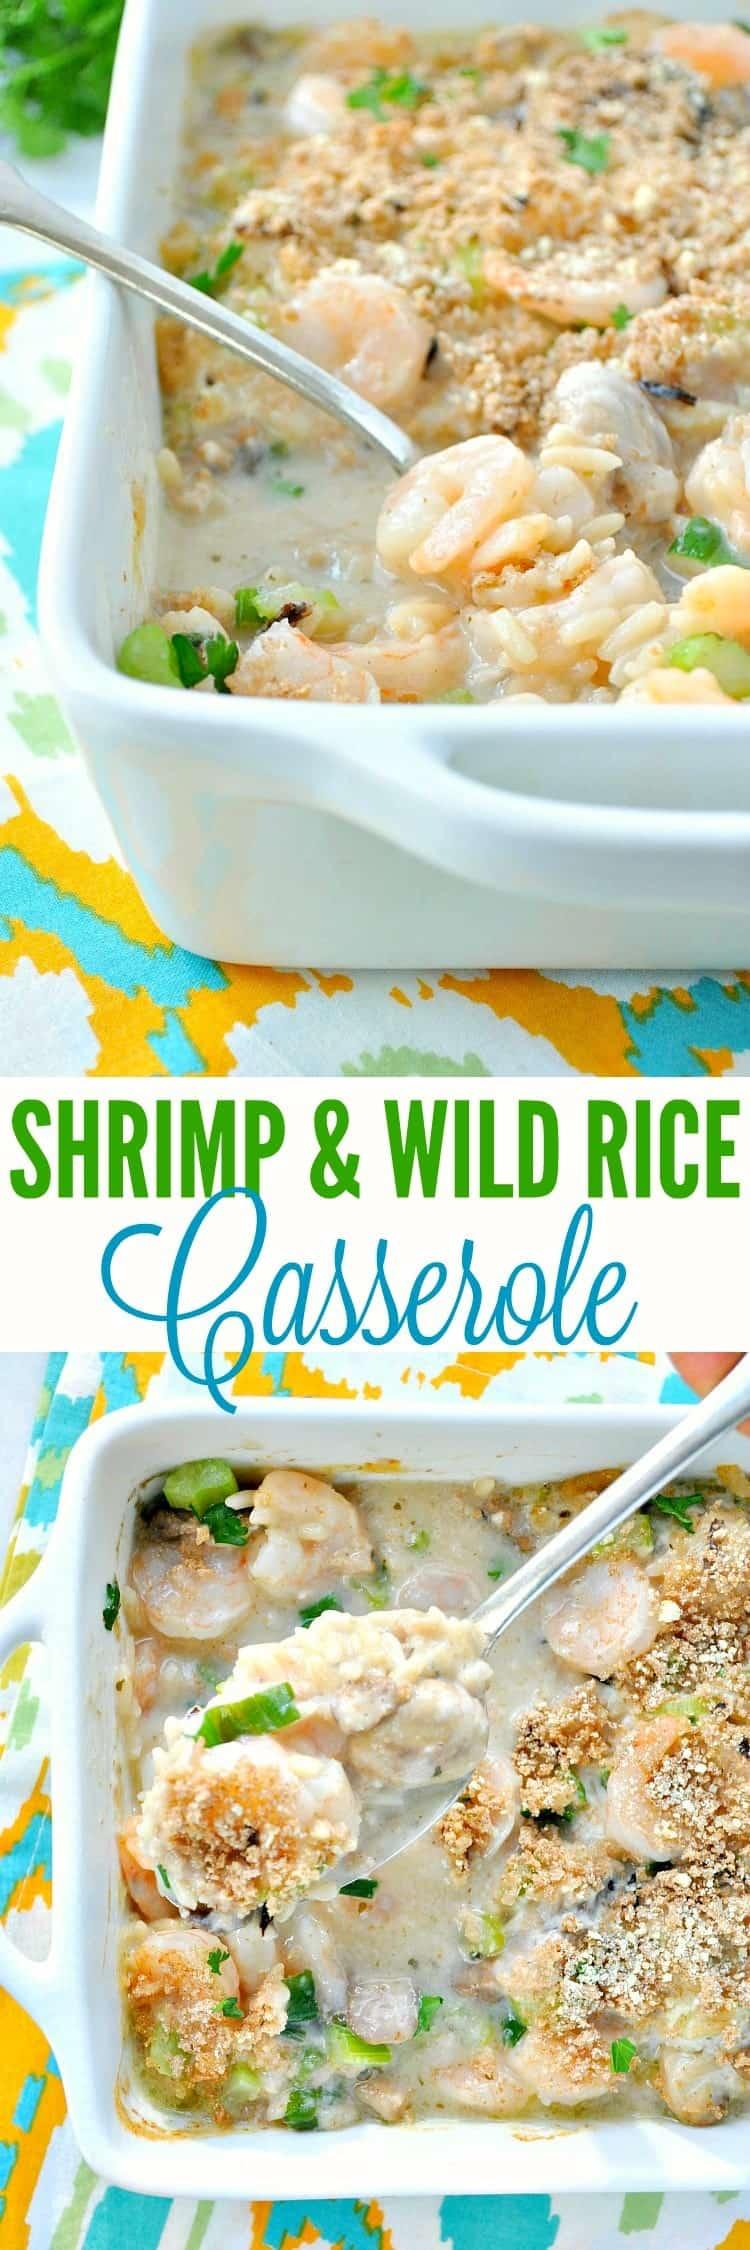 Shrimp and Wild Rice Casserole